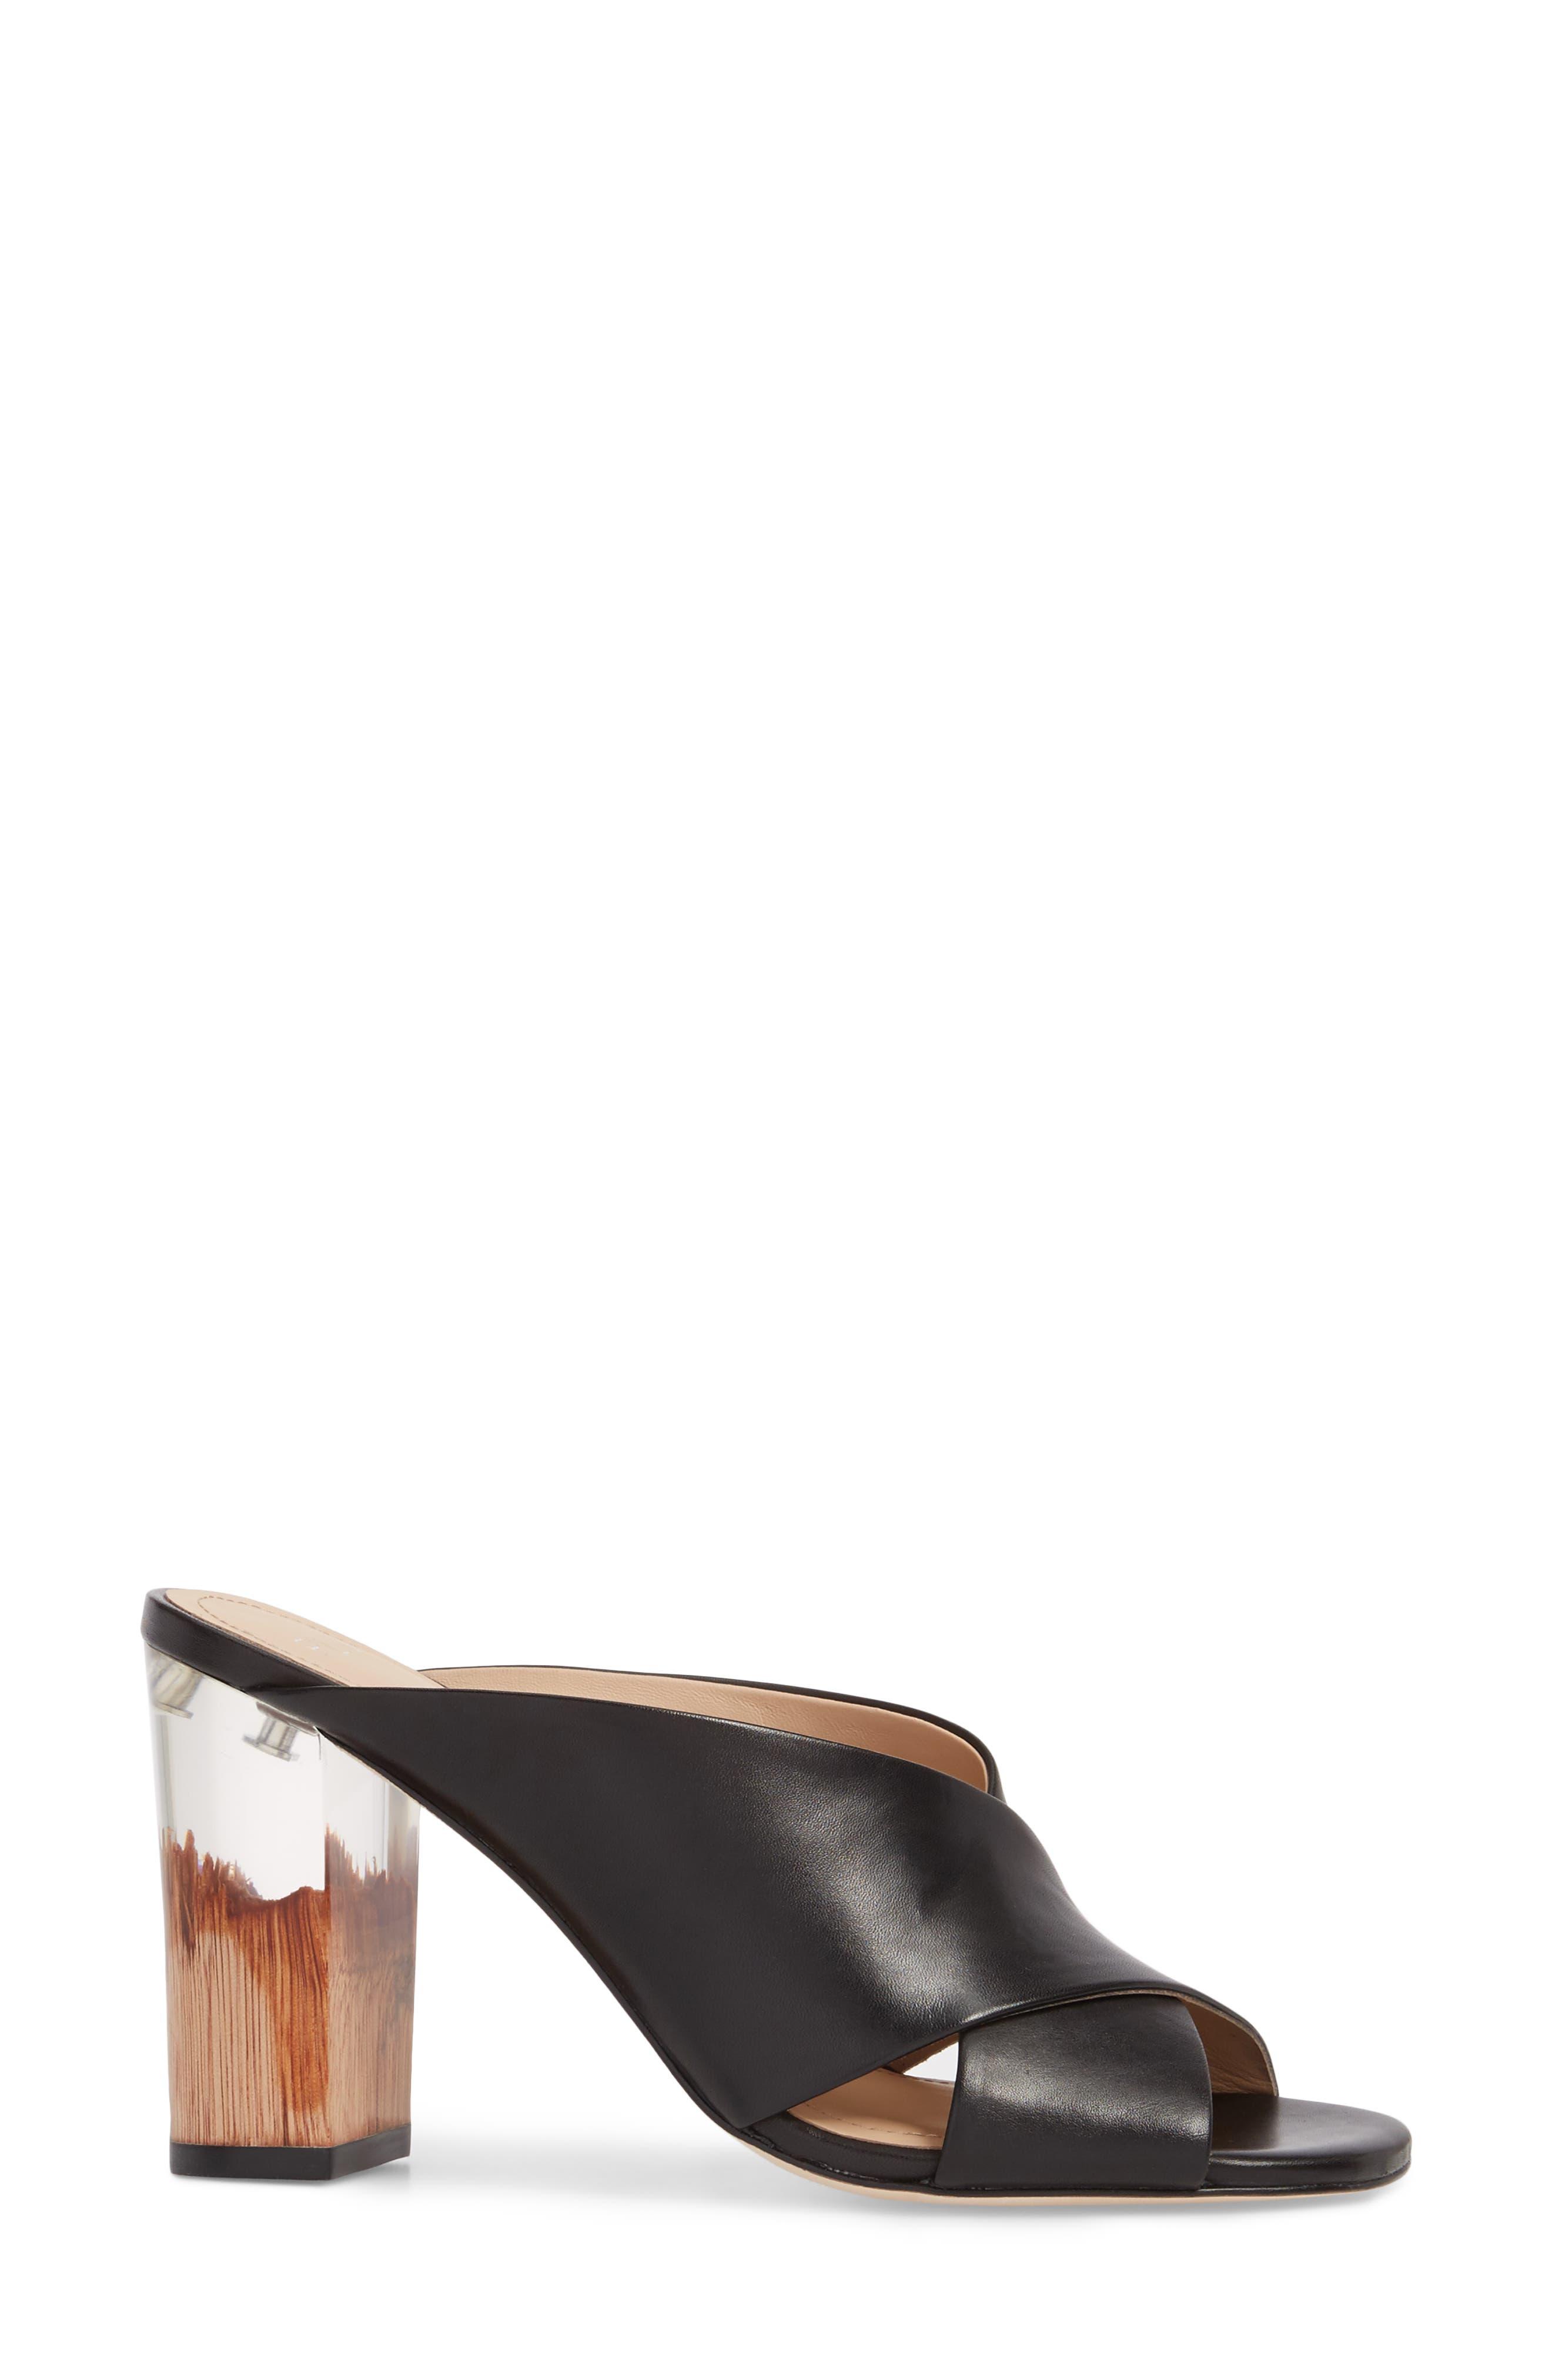 Harley Sandal,                             Alternate thumbnail 3, color,                             Black Leather